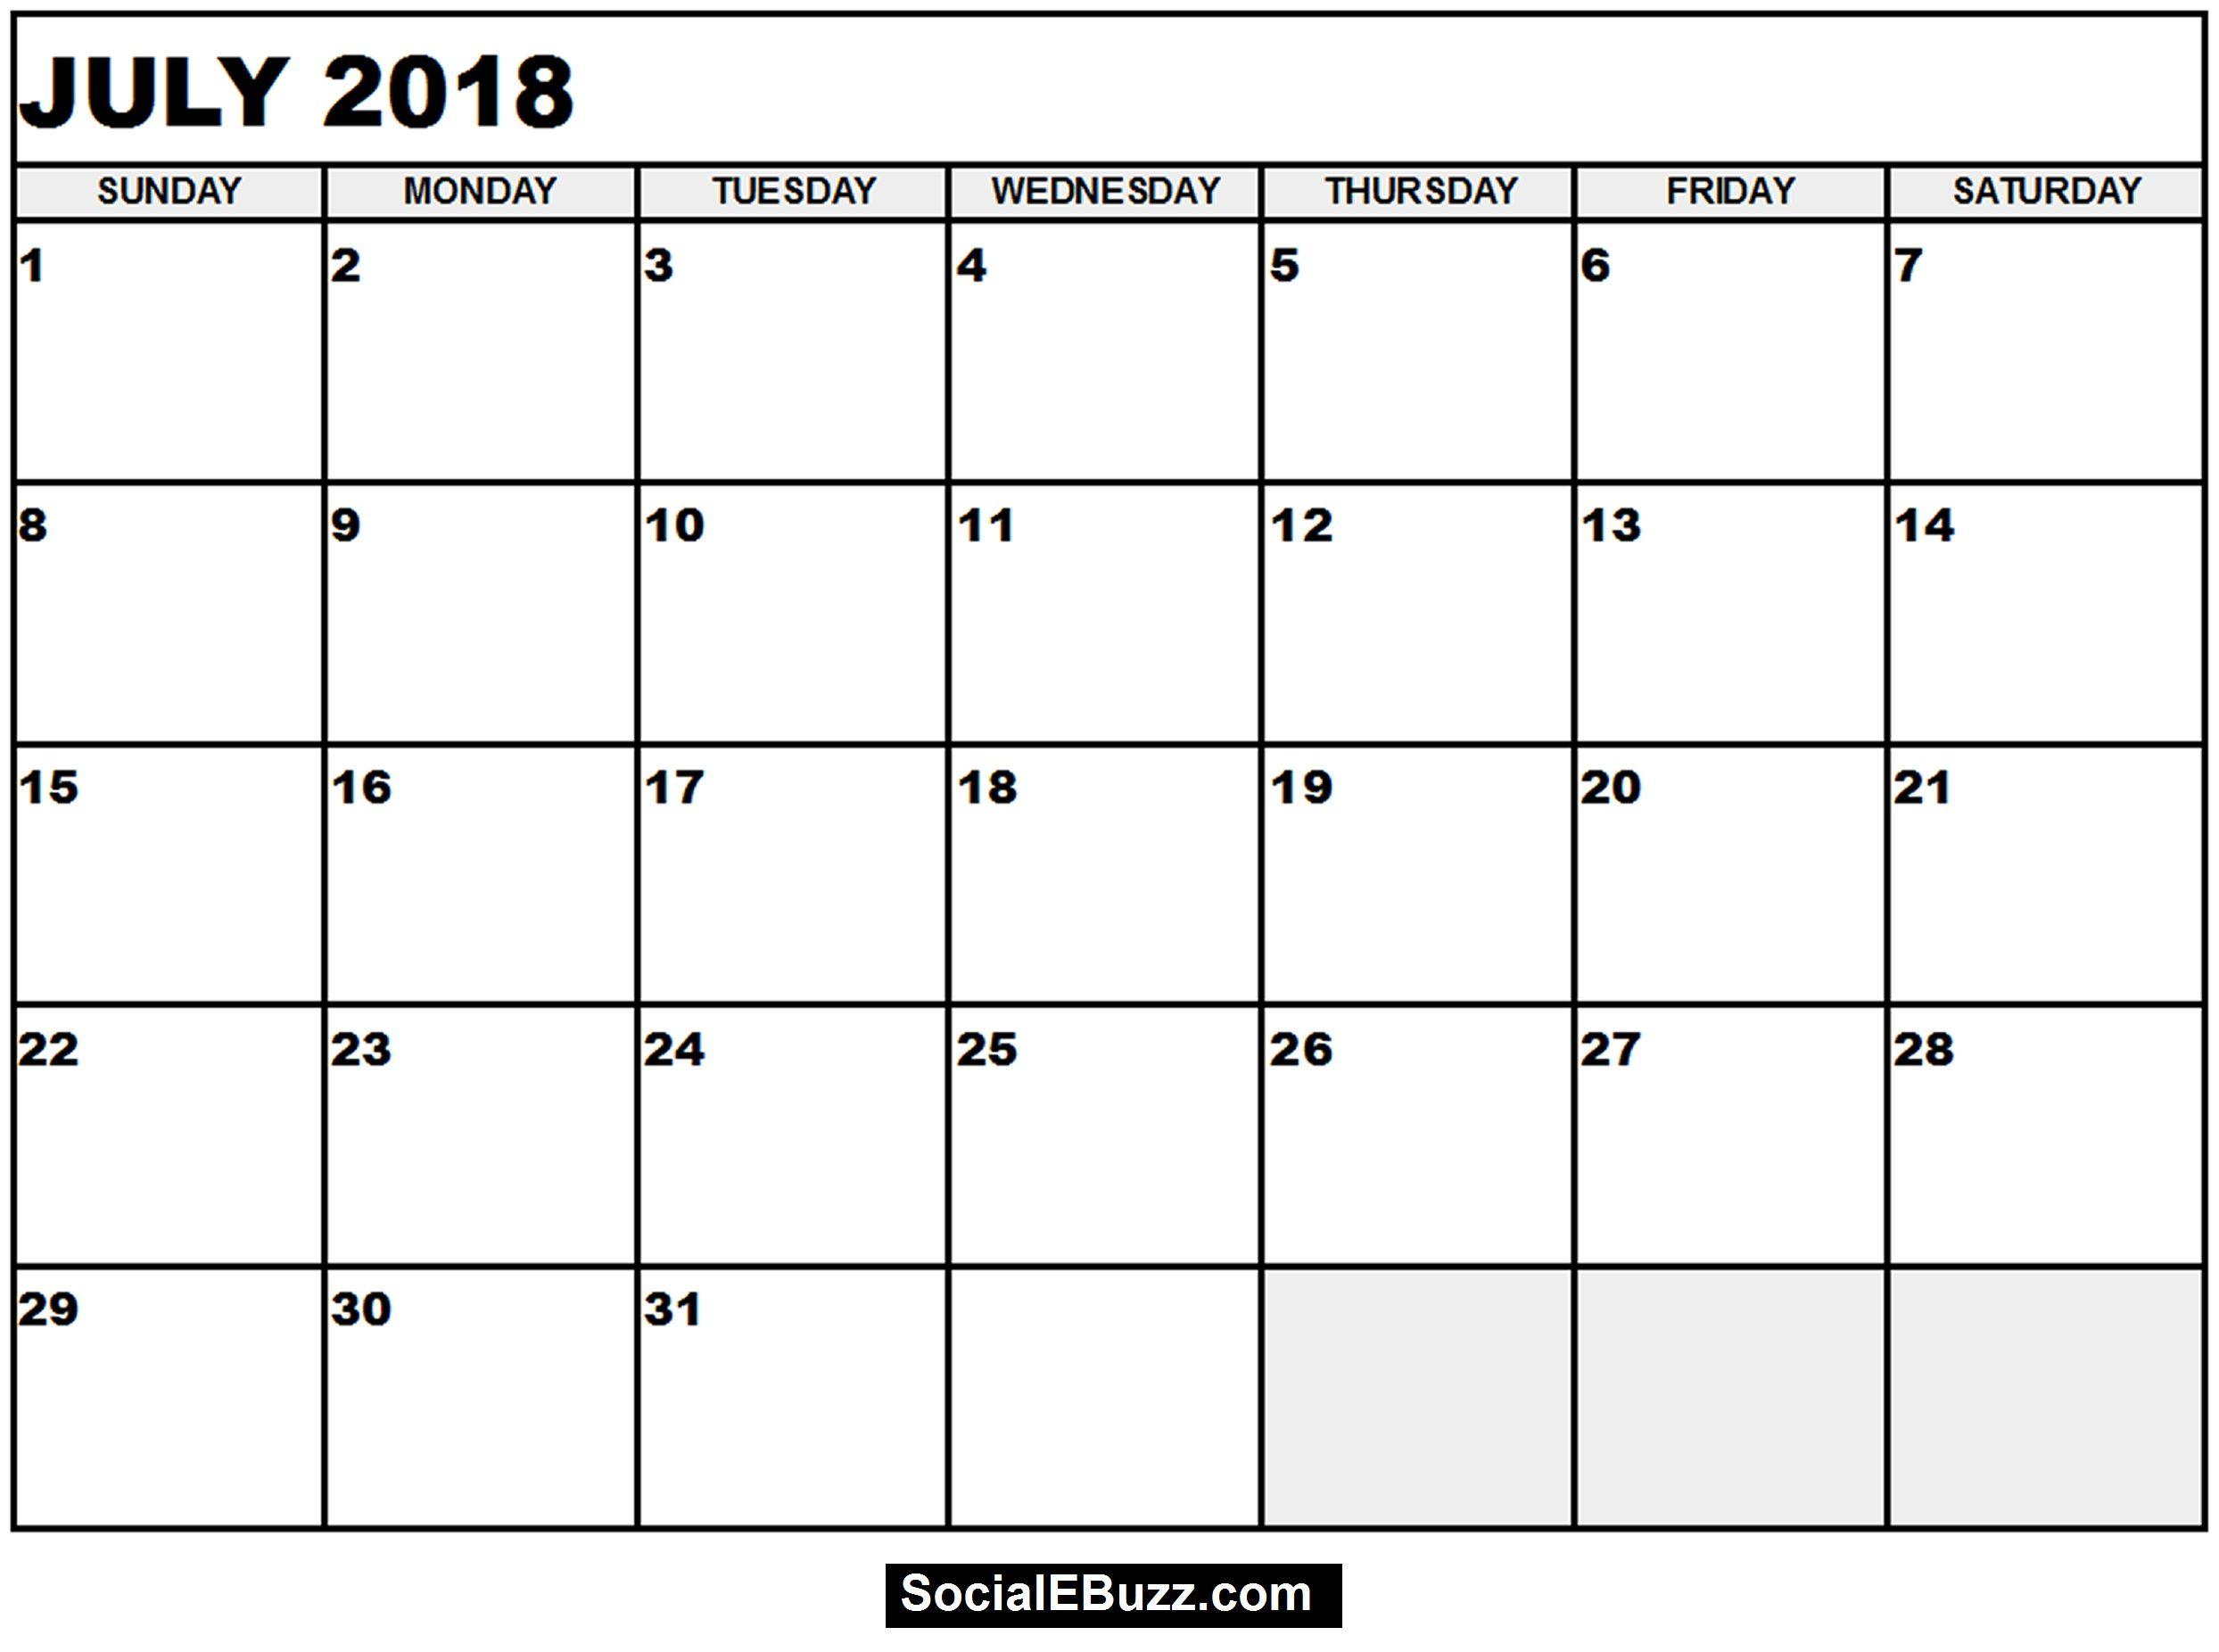 July 2018 Calendar Printable Template, July Calendar 2018, July ...